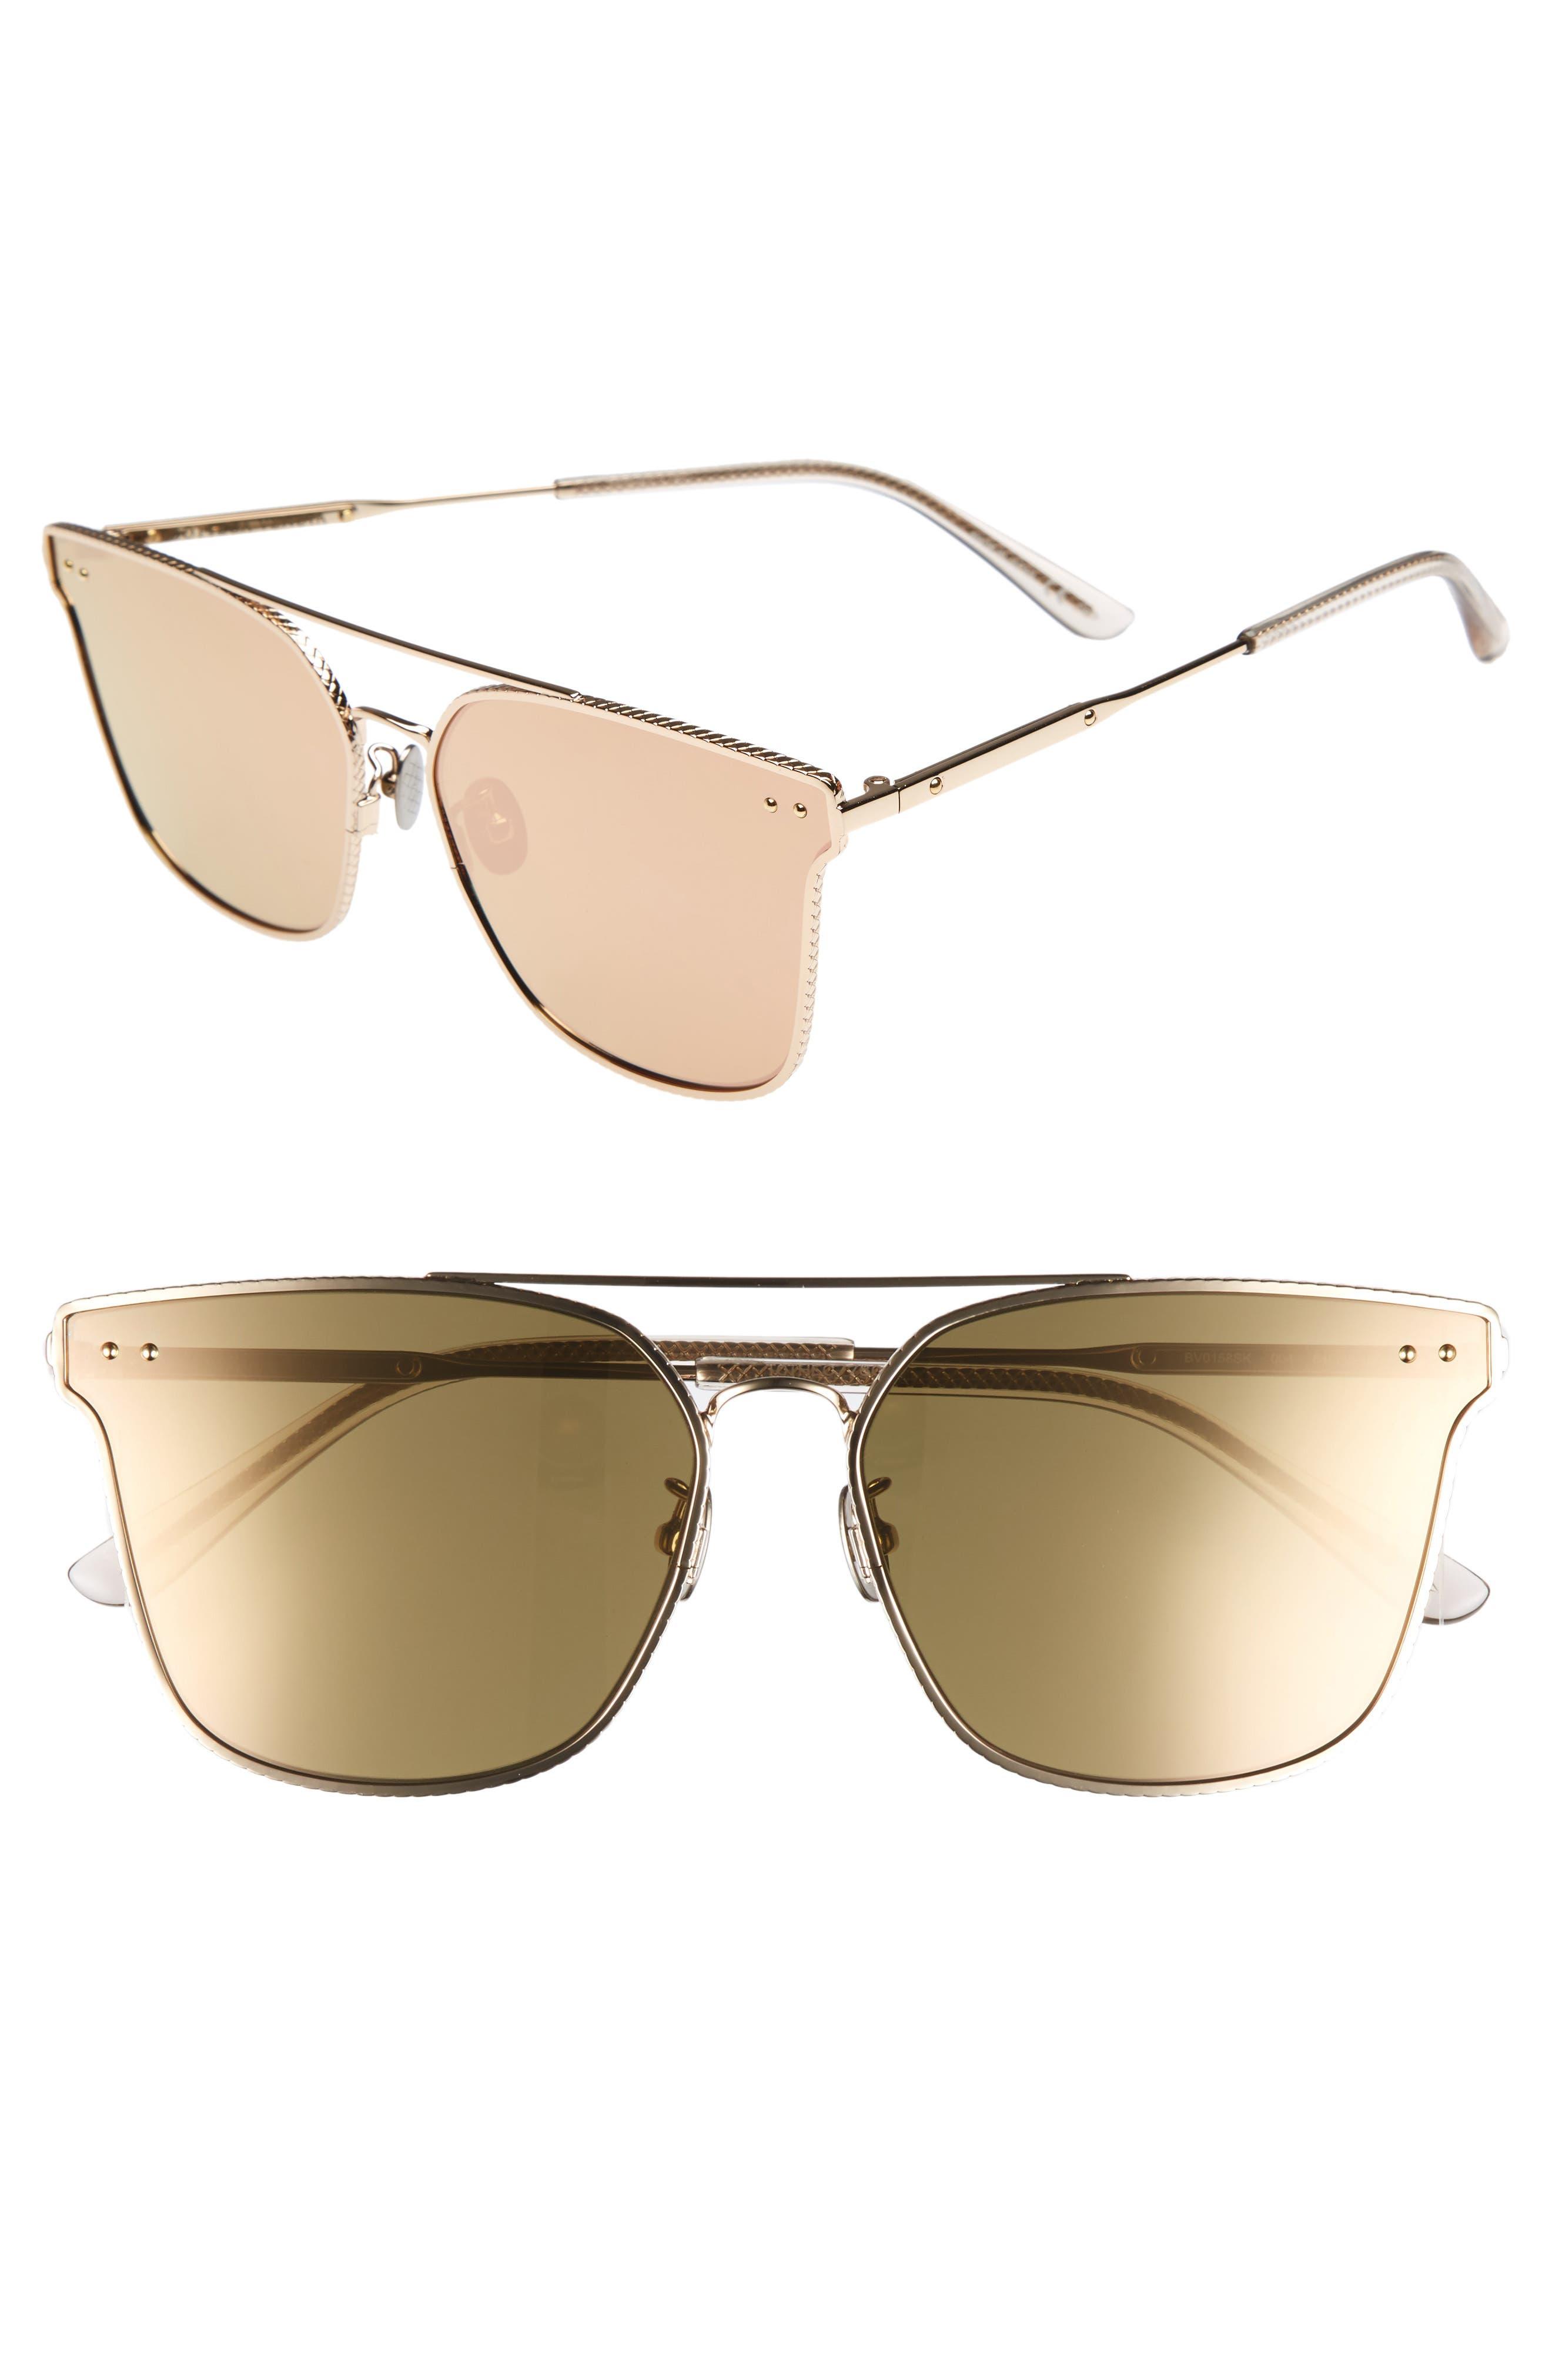 64mm Sunglasses,                         Main,                         color, Gold